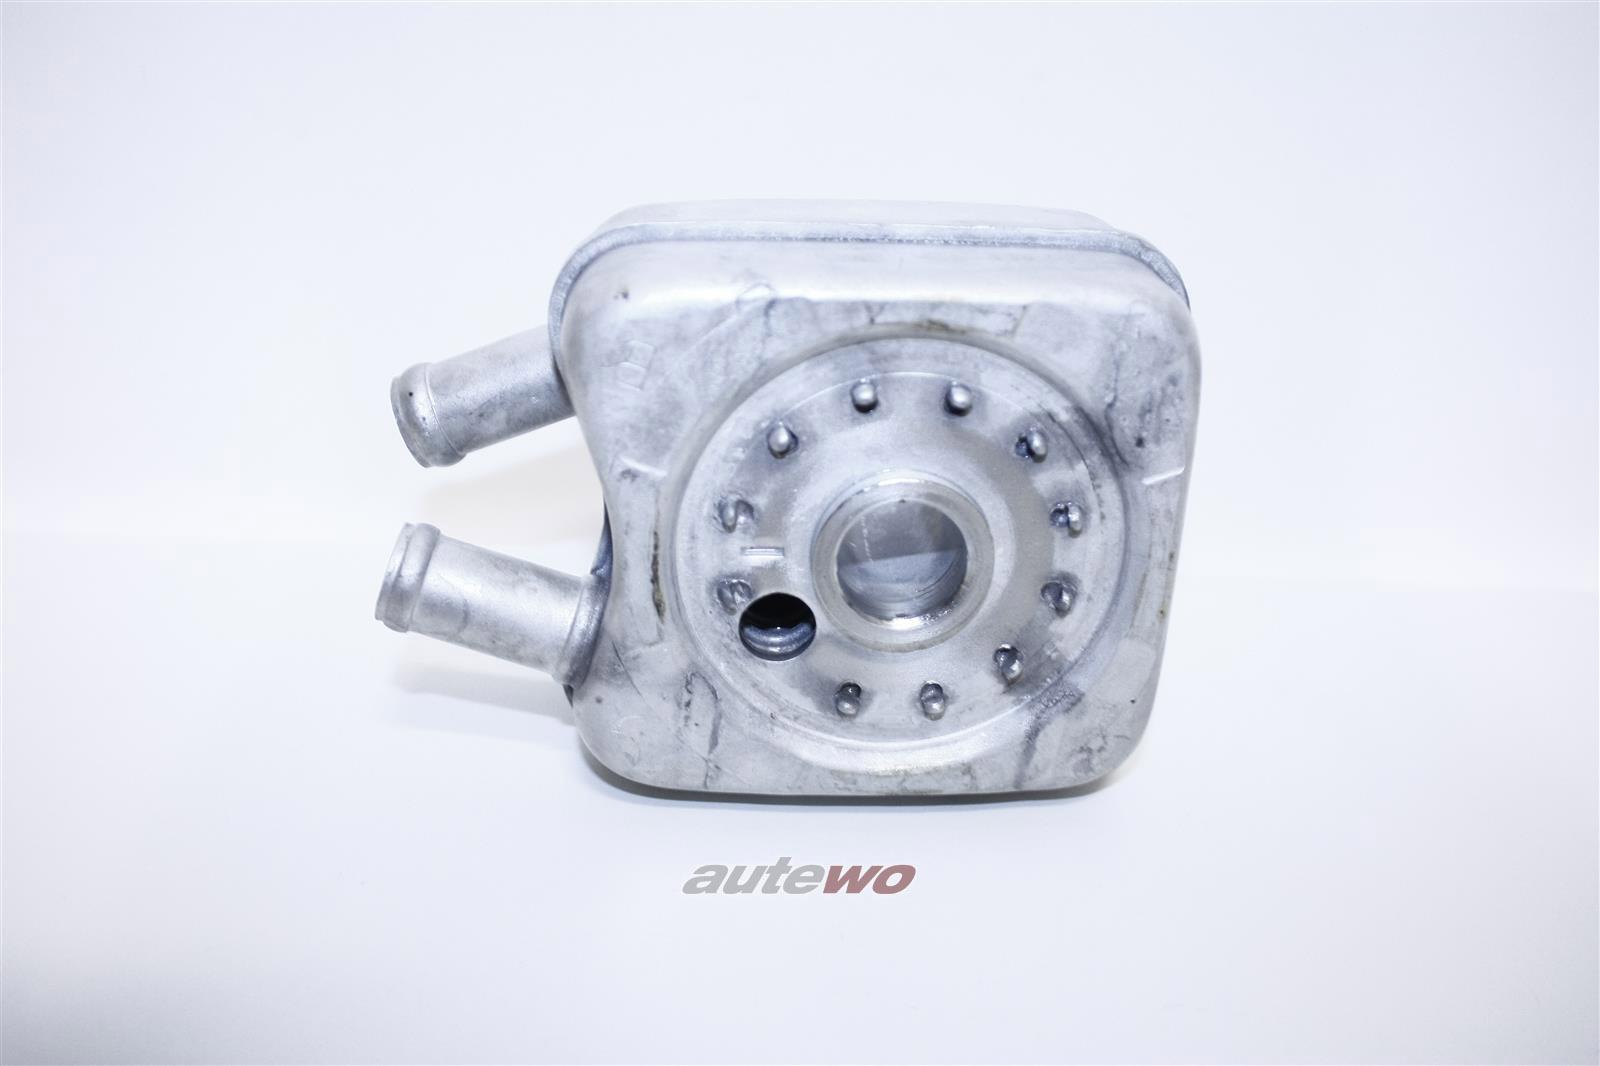 068117021B NEU Audi/VW 80 B4/A3 8L/A4 B5/A6 C4/4B 1.8-2.8l Ölkühler